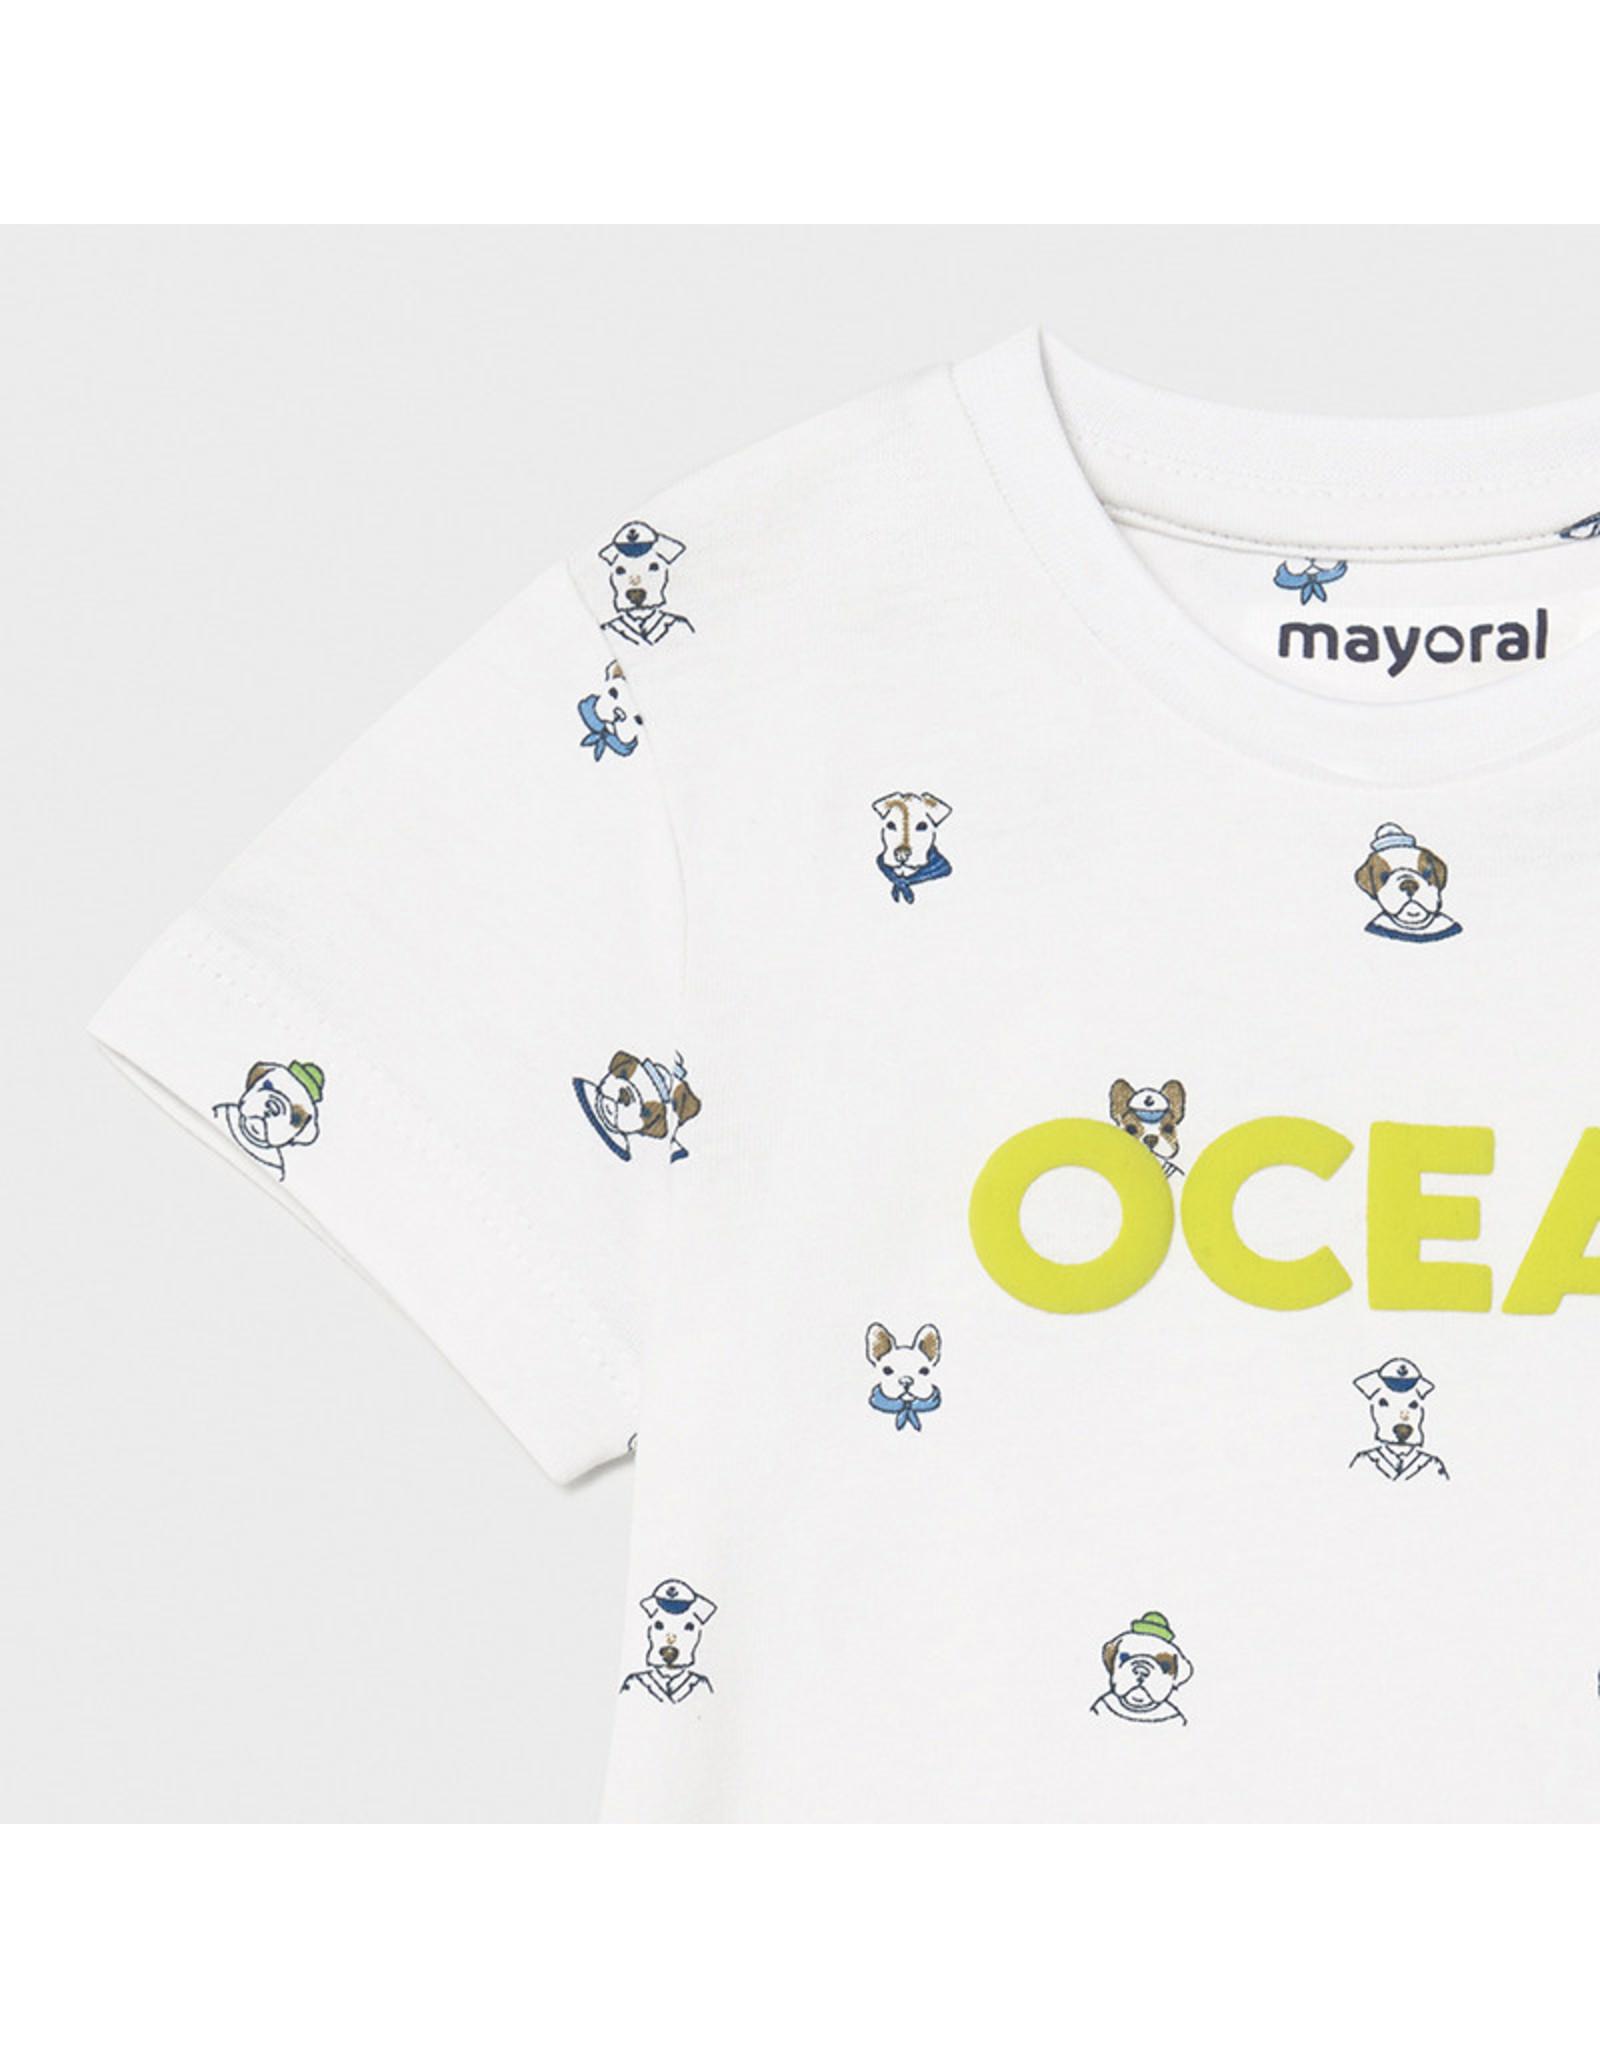 Mayoral s/s 2 pcs printed t-shirt set Lavender